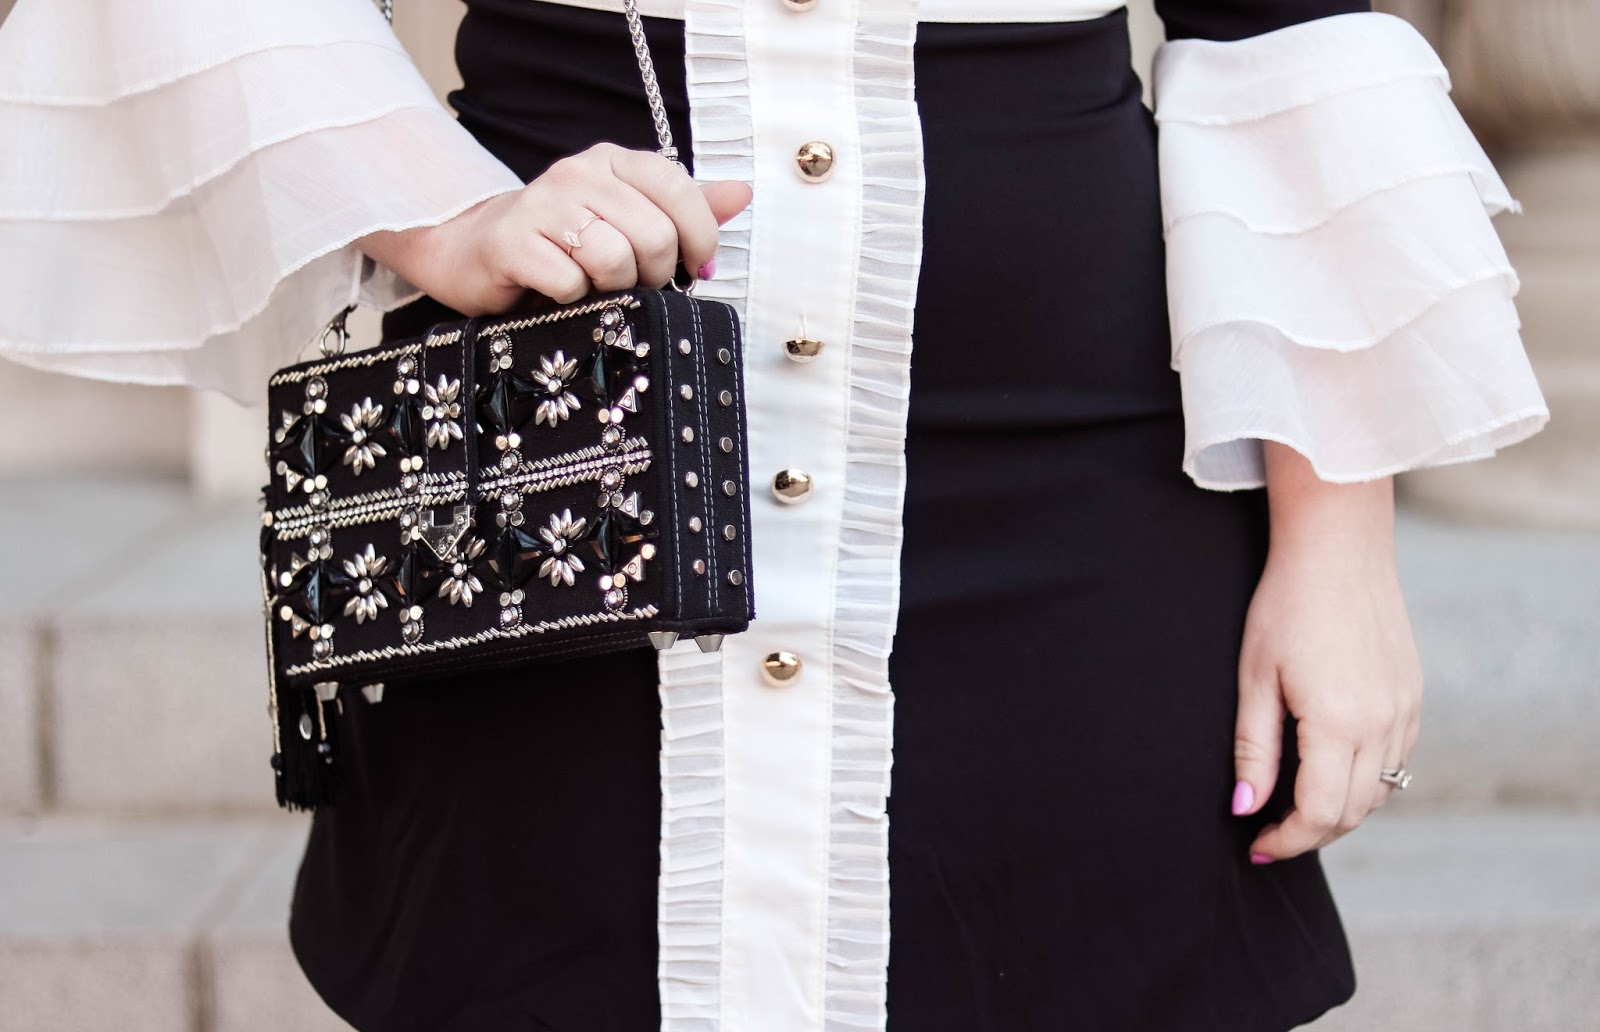 Elizabeth Hugen of Lizzie in Lace wears a black and white ruffled dress